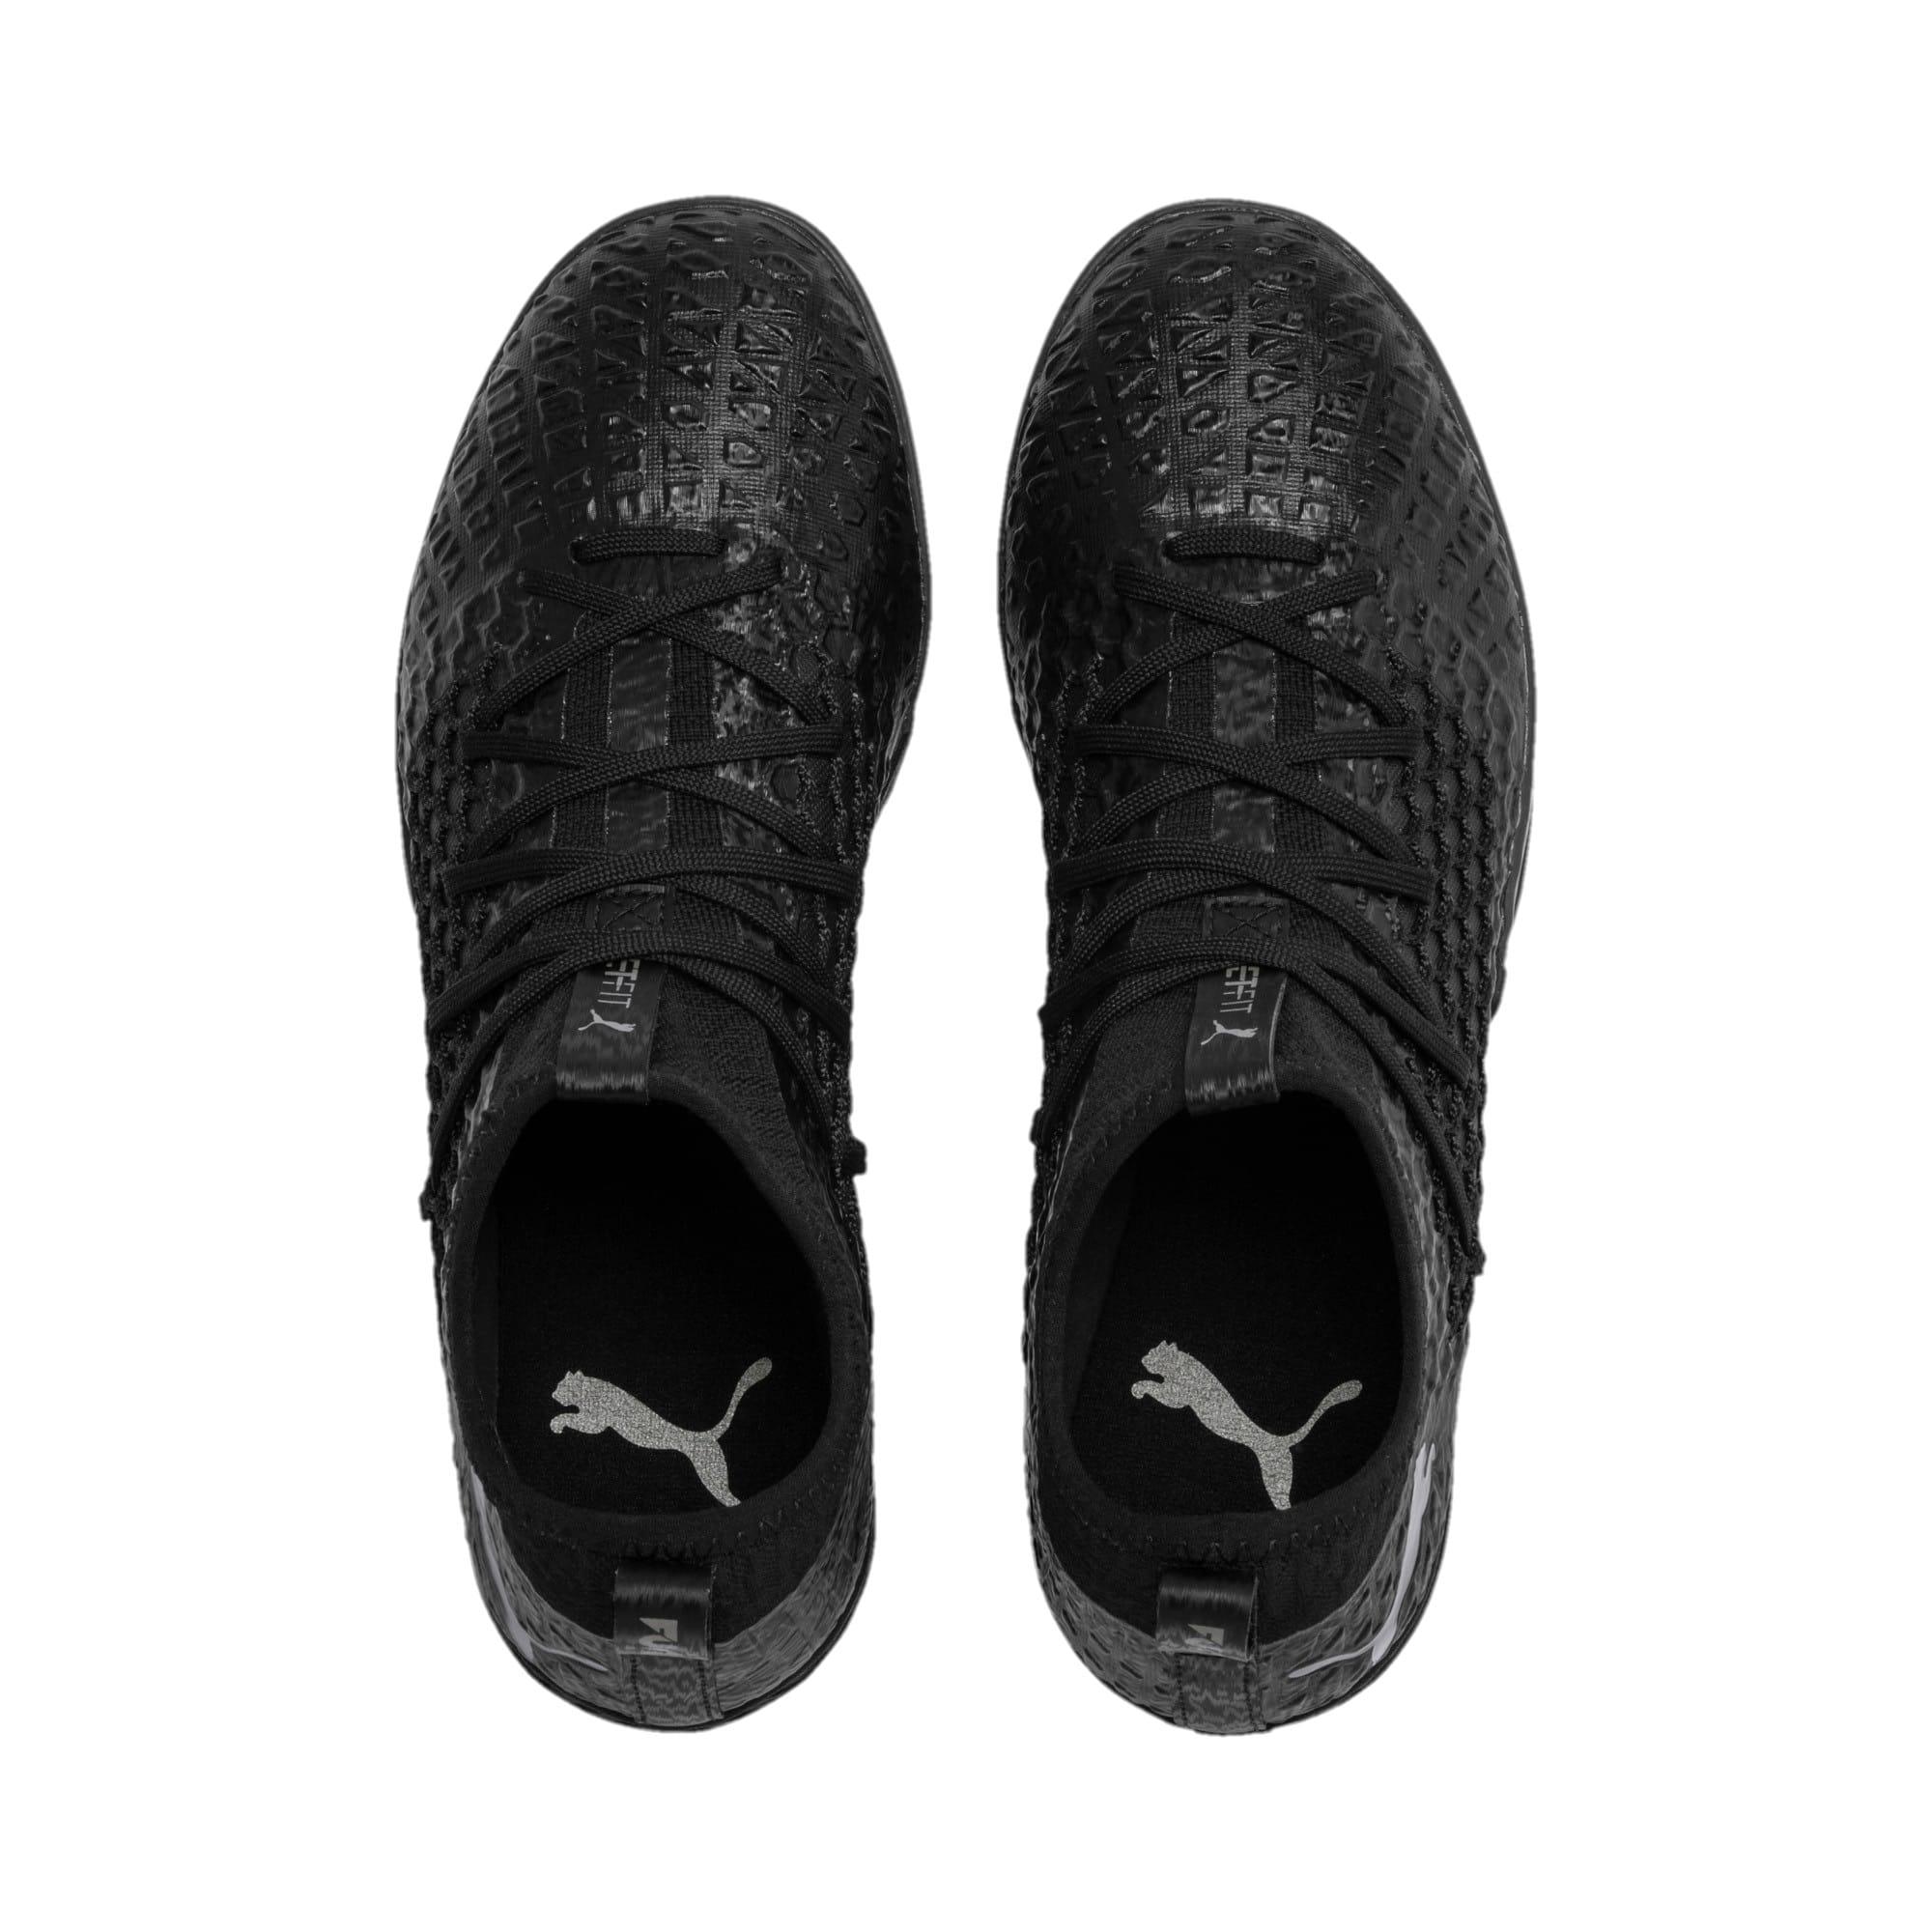 Thumbnail 7 of FUTURE 4.3 NETFIT IT Men's Soccer Shoes, Black-Black-Puma Aged Silver, medium